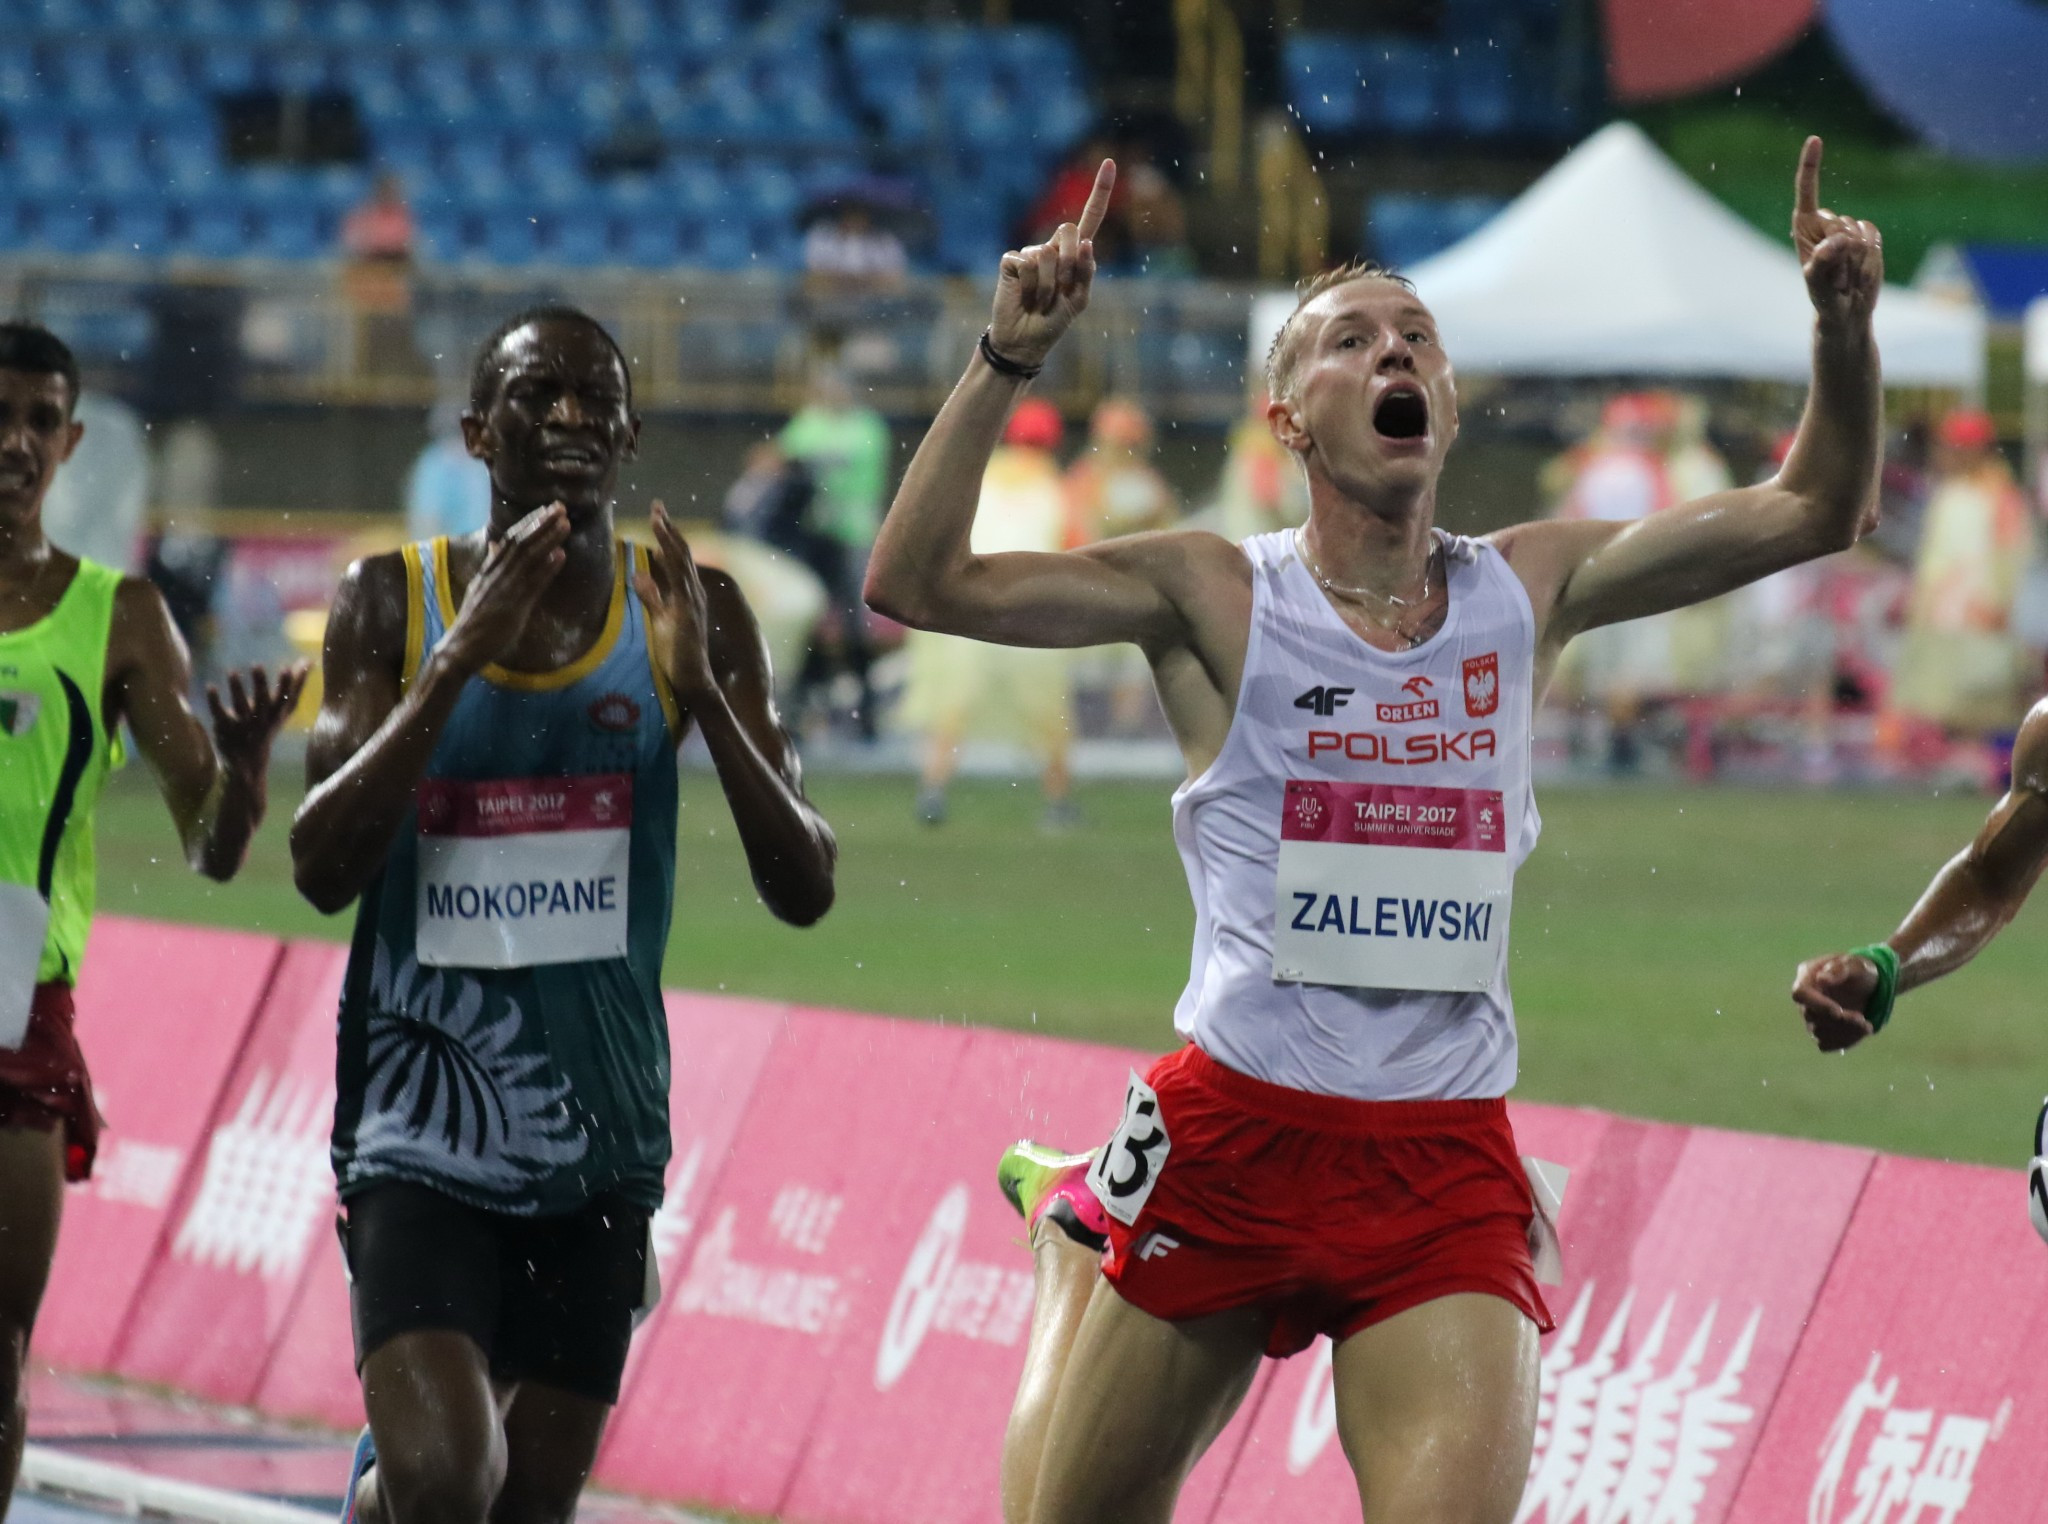 Poland's Krystian Zalewski pipped South Africa's Rantso Alfred Mokopane to men's 3,000m steeplechase gold ©Taipei 2017